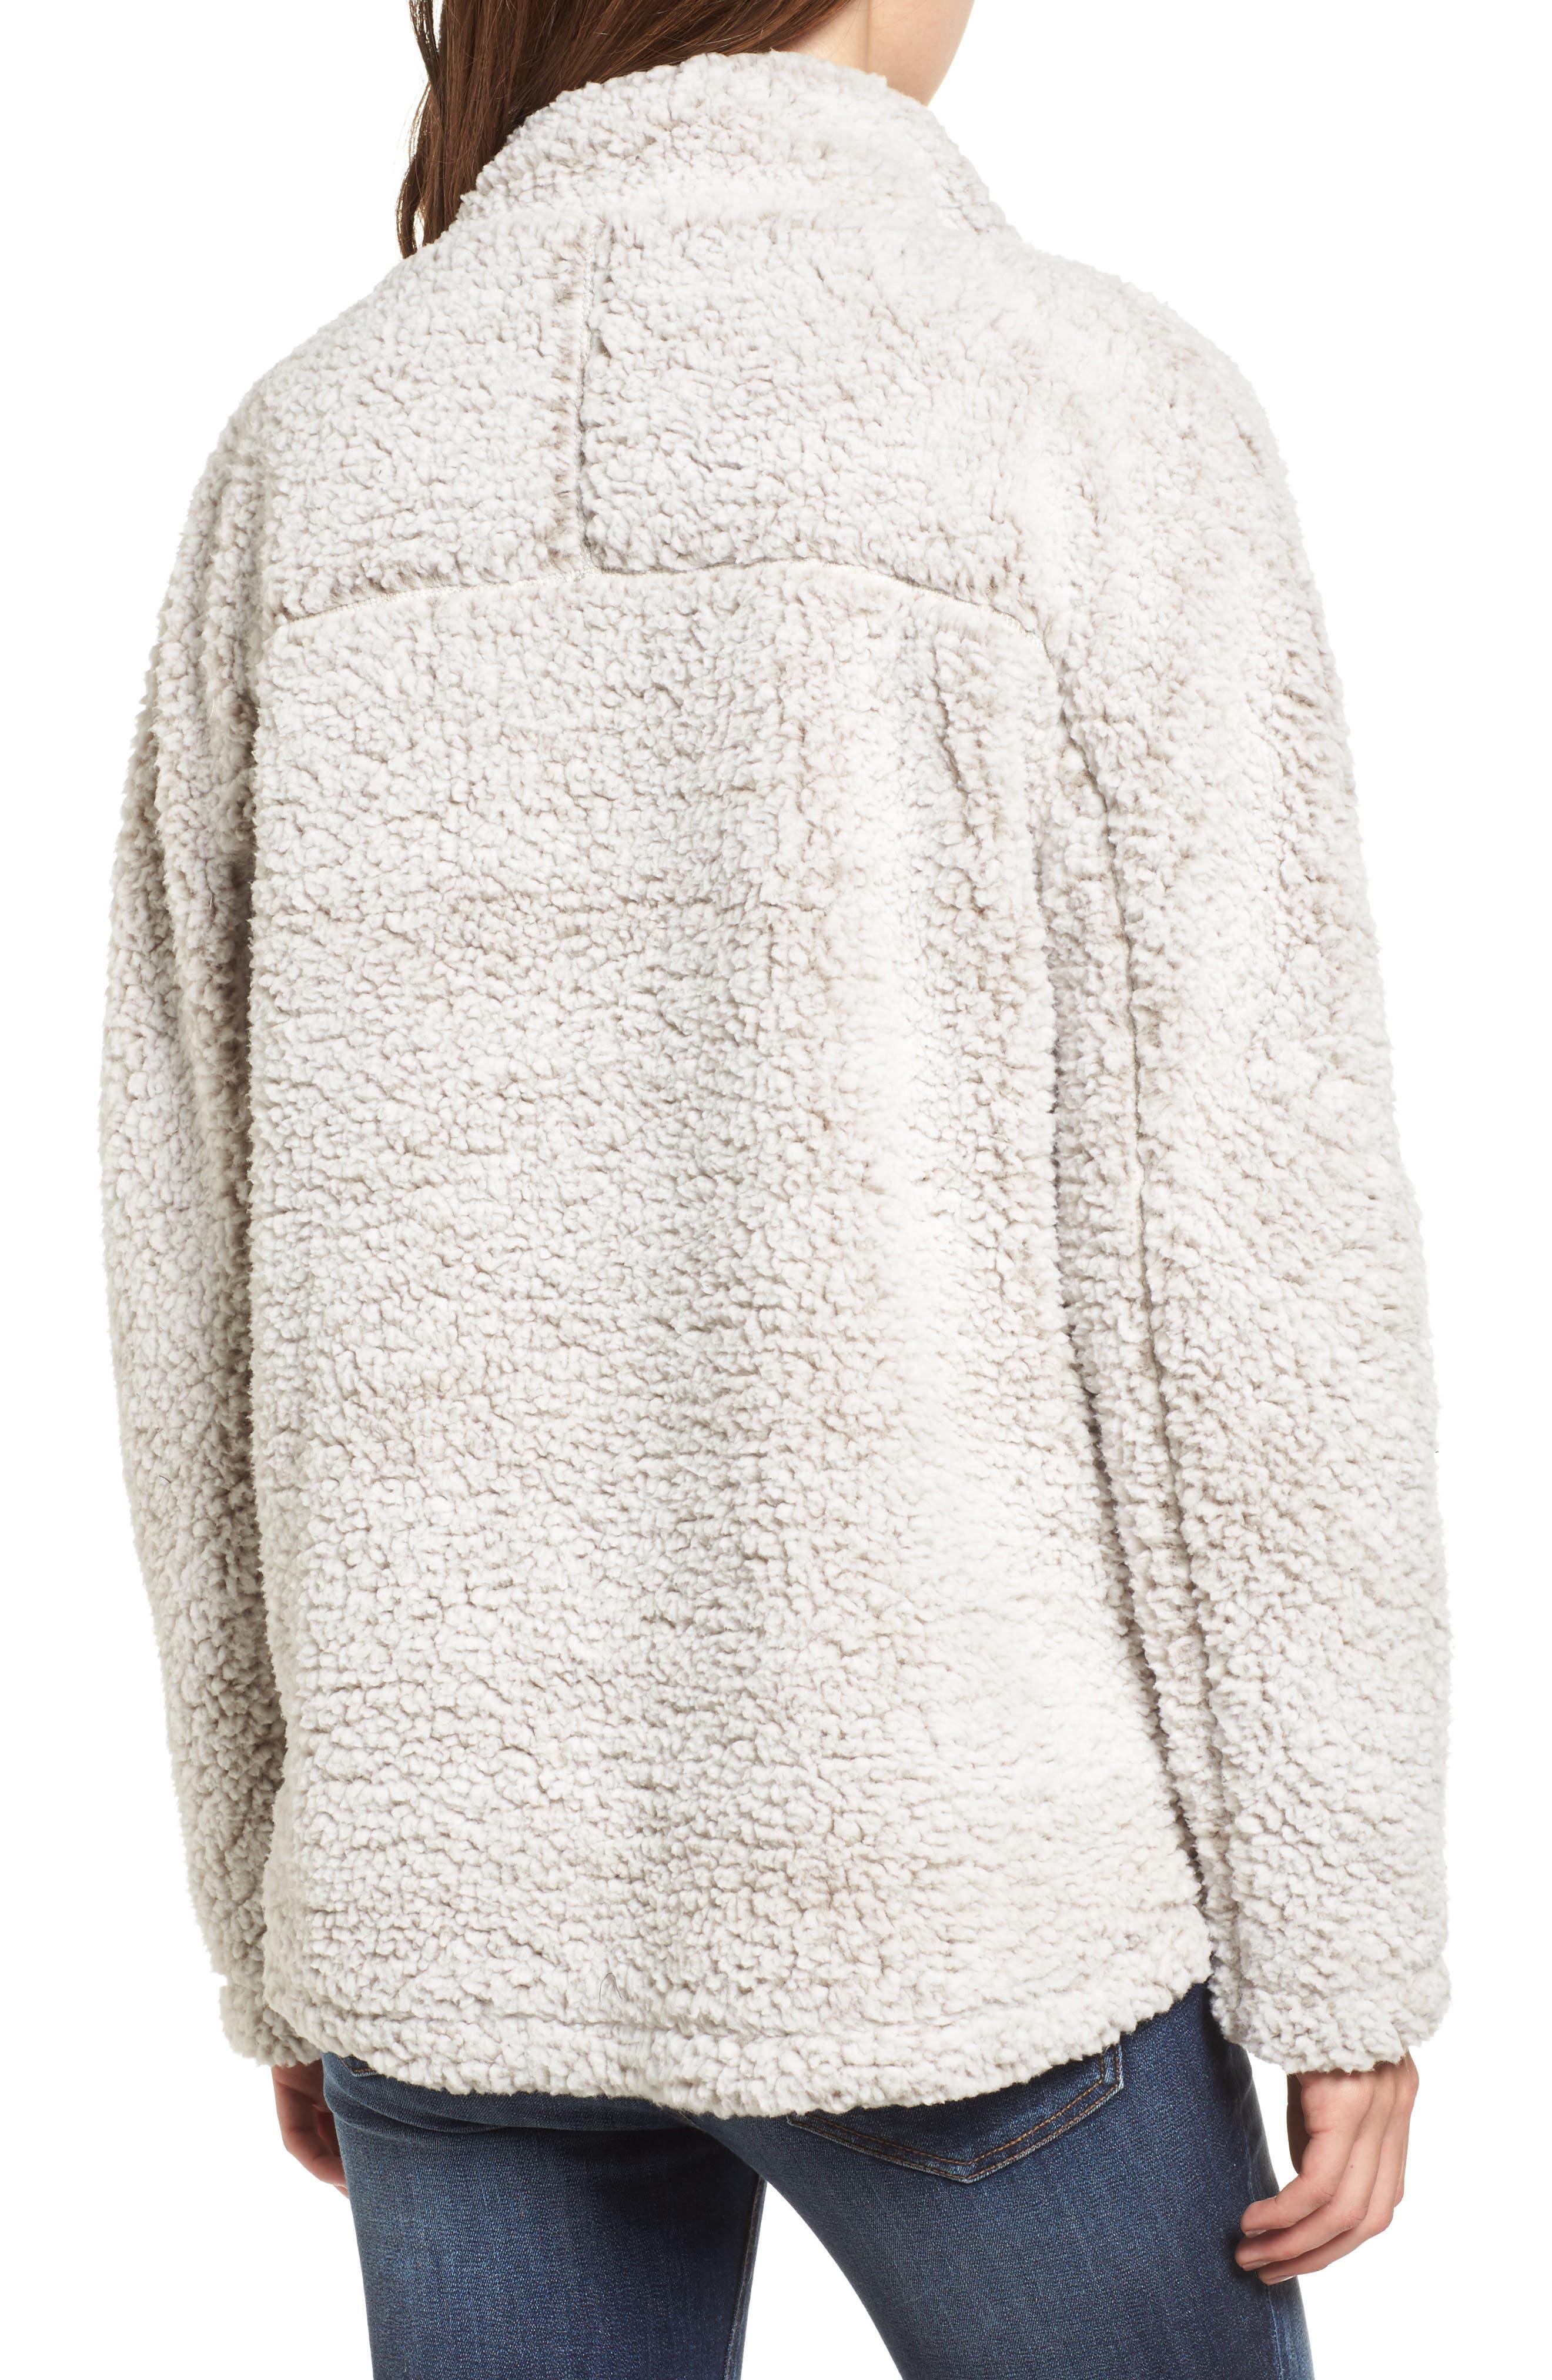 Wubby Fleece Pullover,                             Alternate thumbnail 2, color,                             Ivory